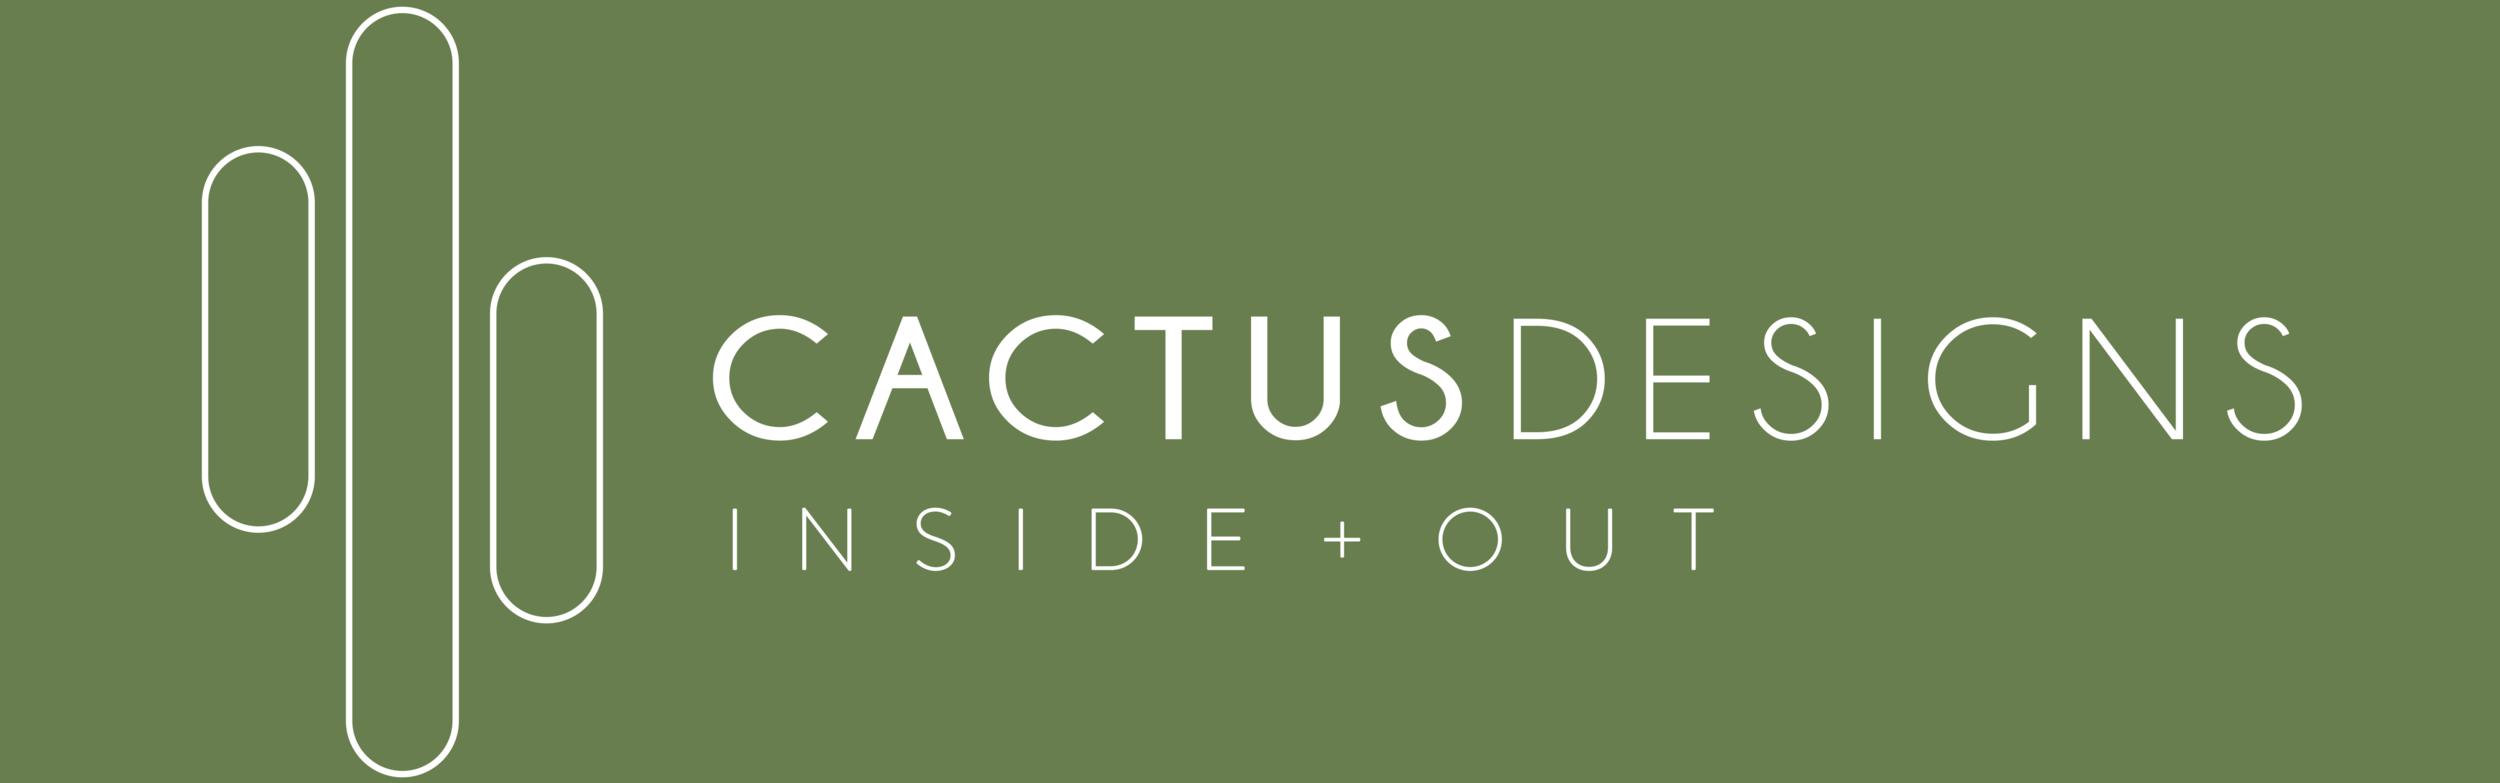 - CACTUS DESIGNS FOR INSIDE + OUT69 Roslyn Rd, Belmont, Victoria, Aus 3216p: 03 5244 0921e: info@cactusdesignsaus.com.auCopyright 2019 Cactus Designs